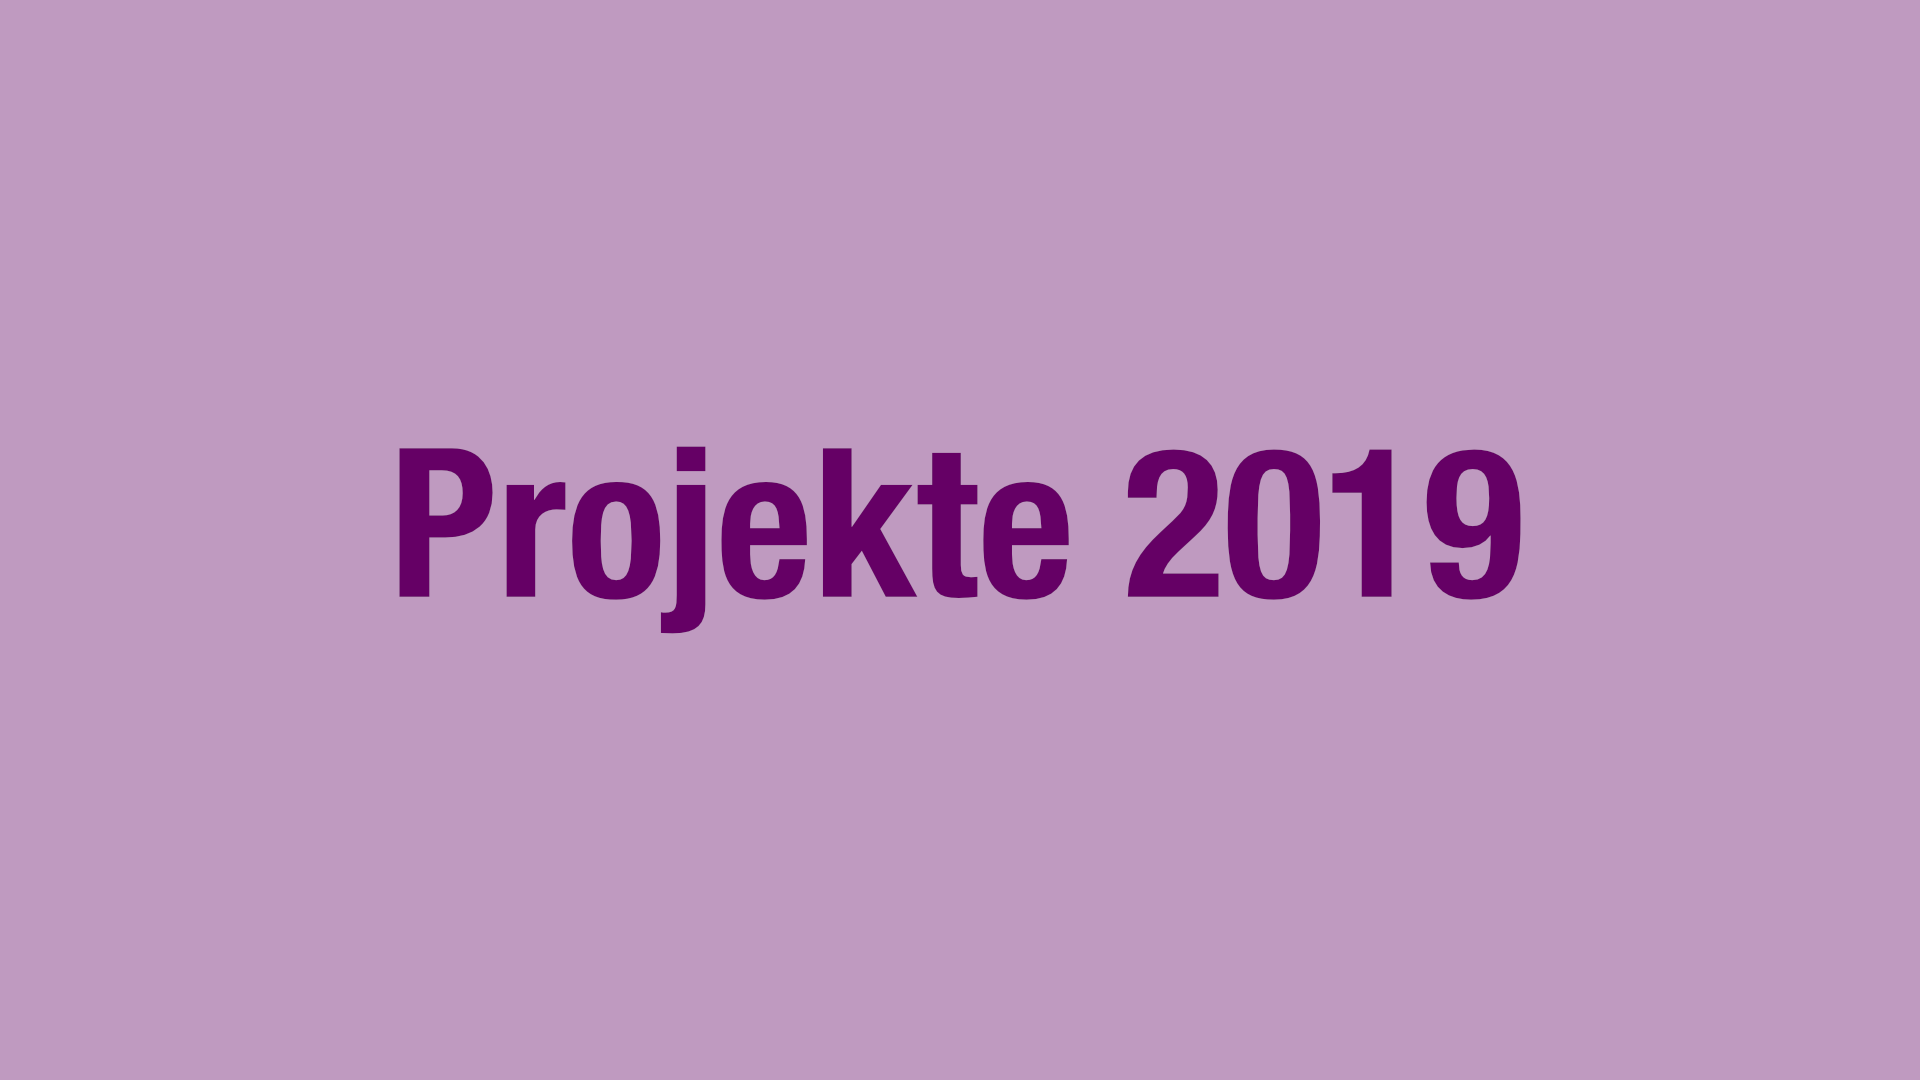 Projekte 2019